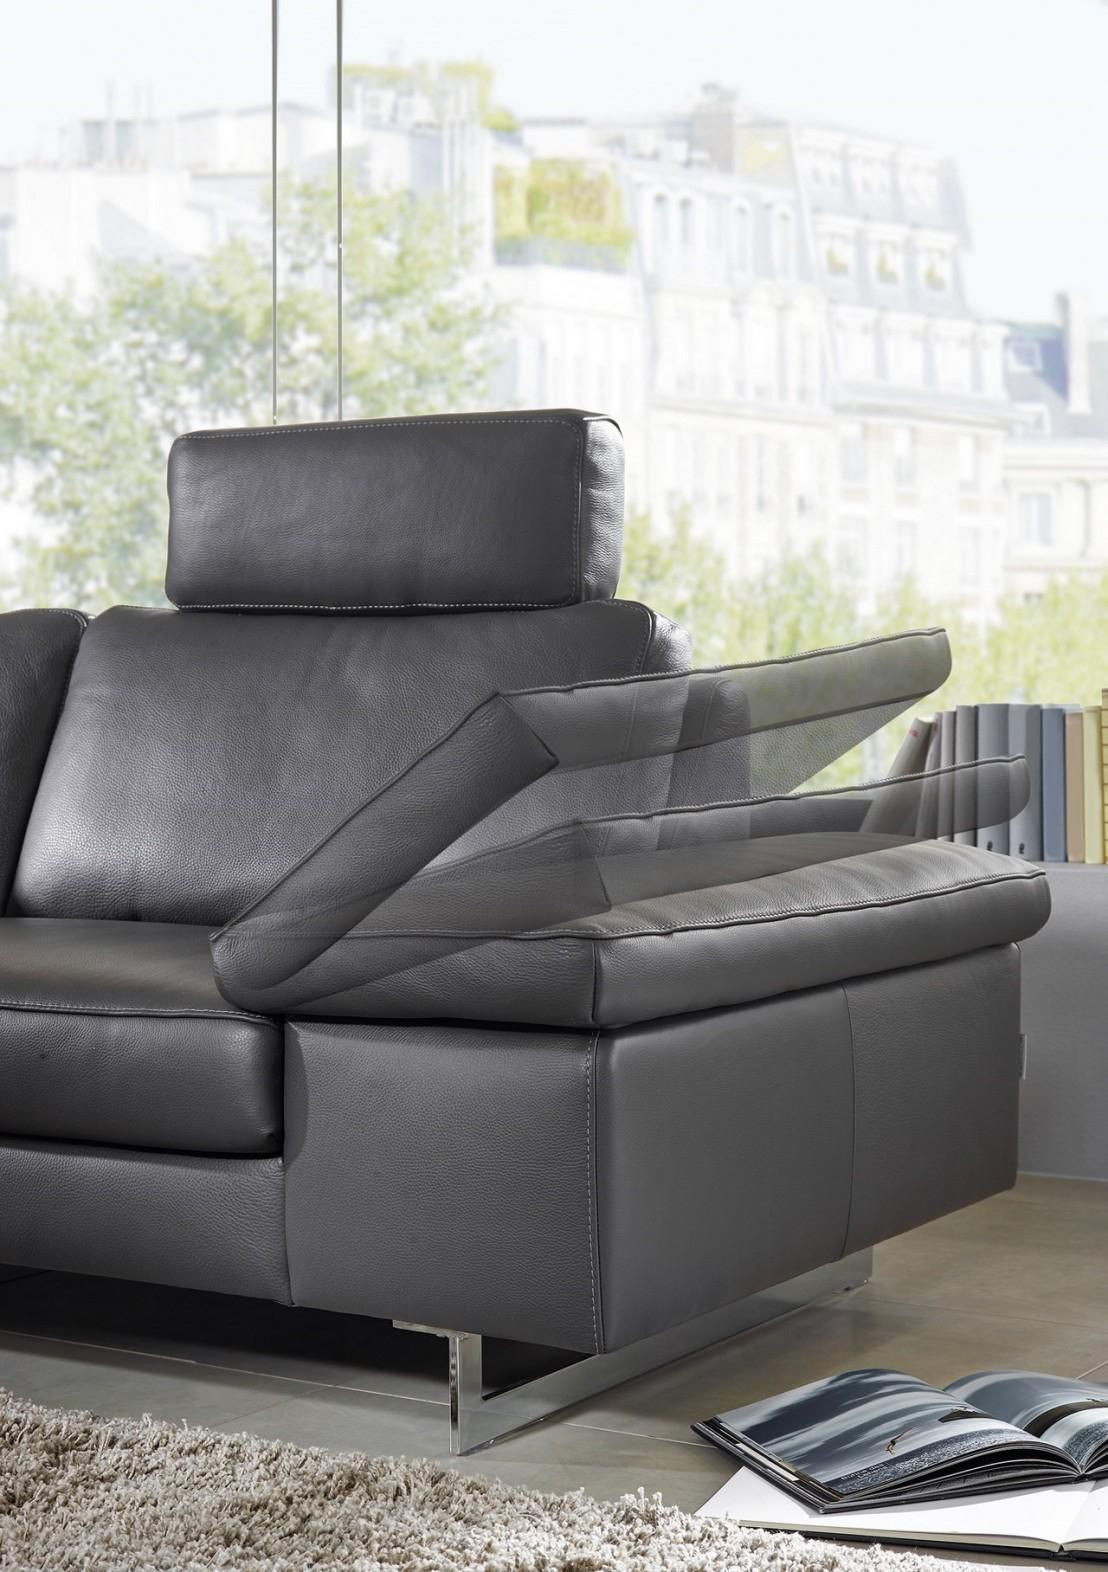 Canapé 3 places ICON design en cuir